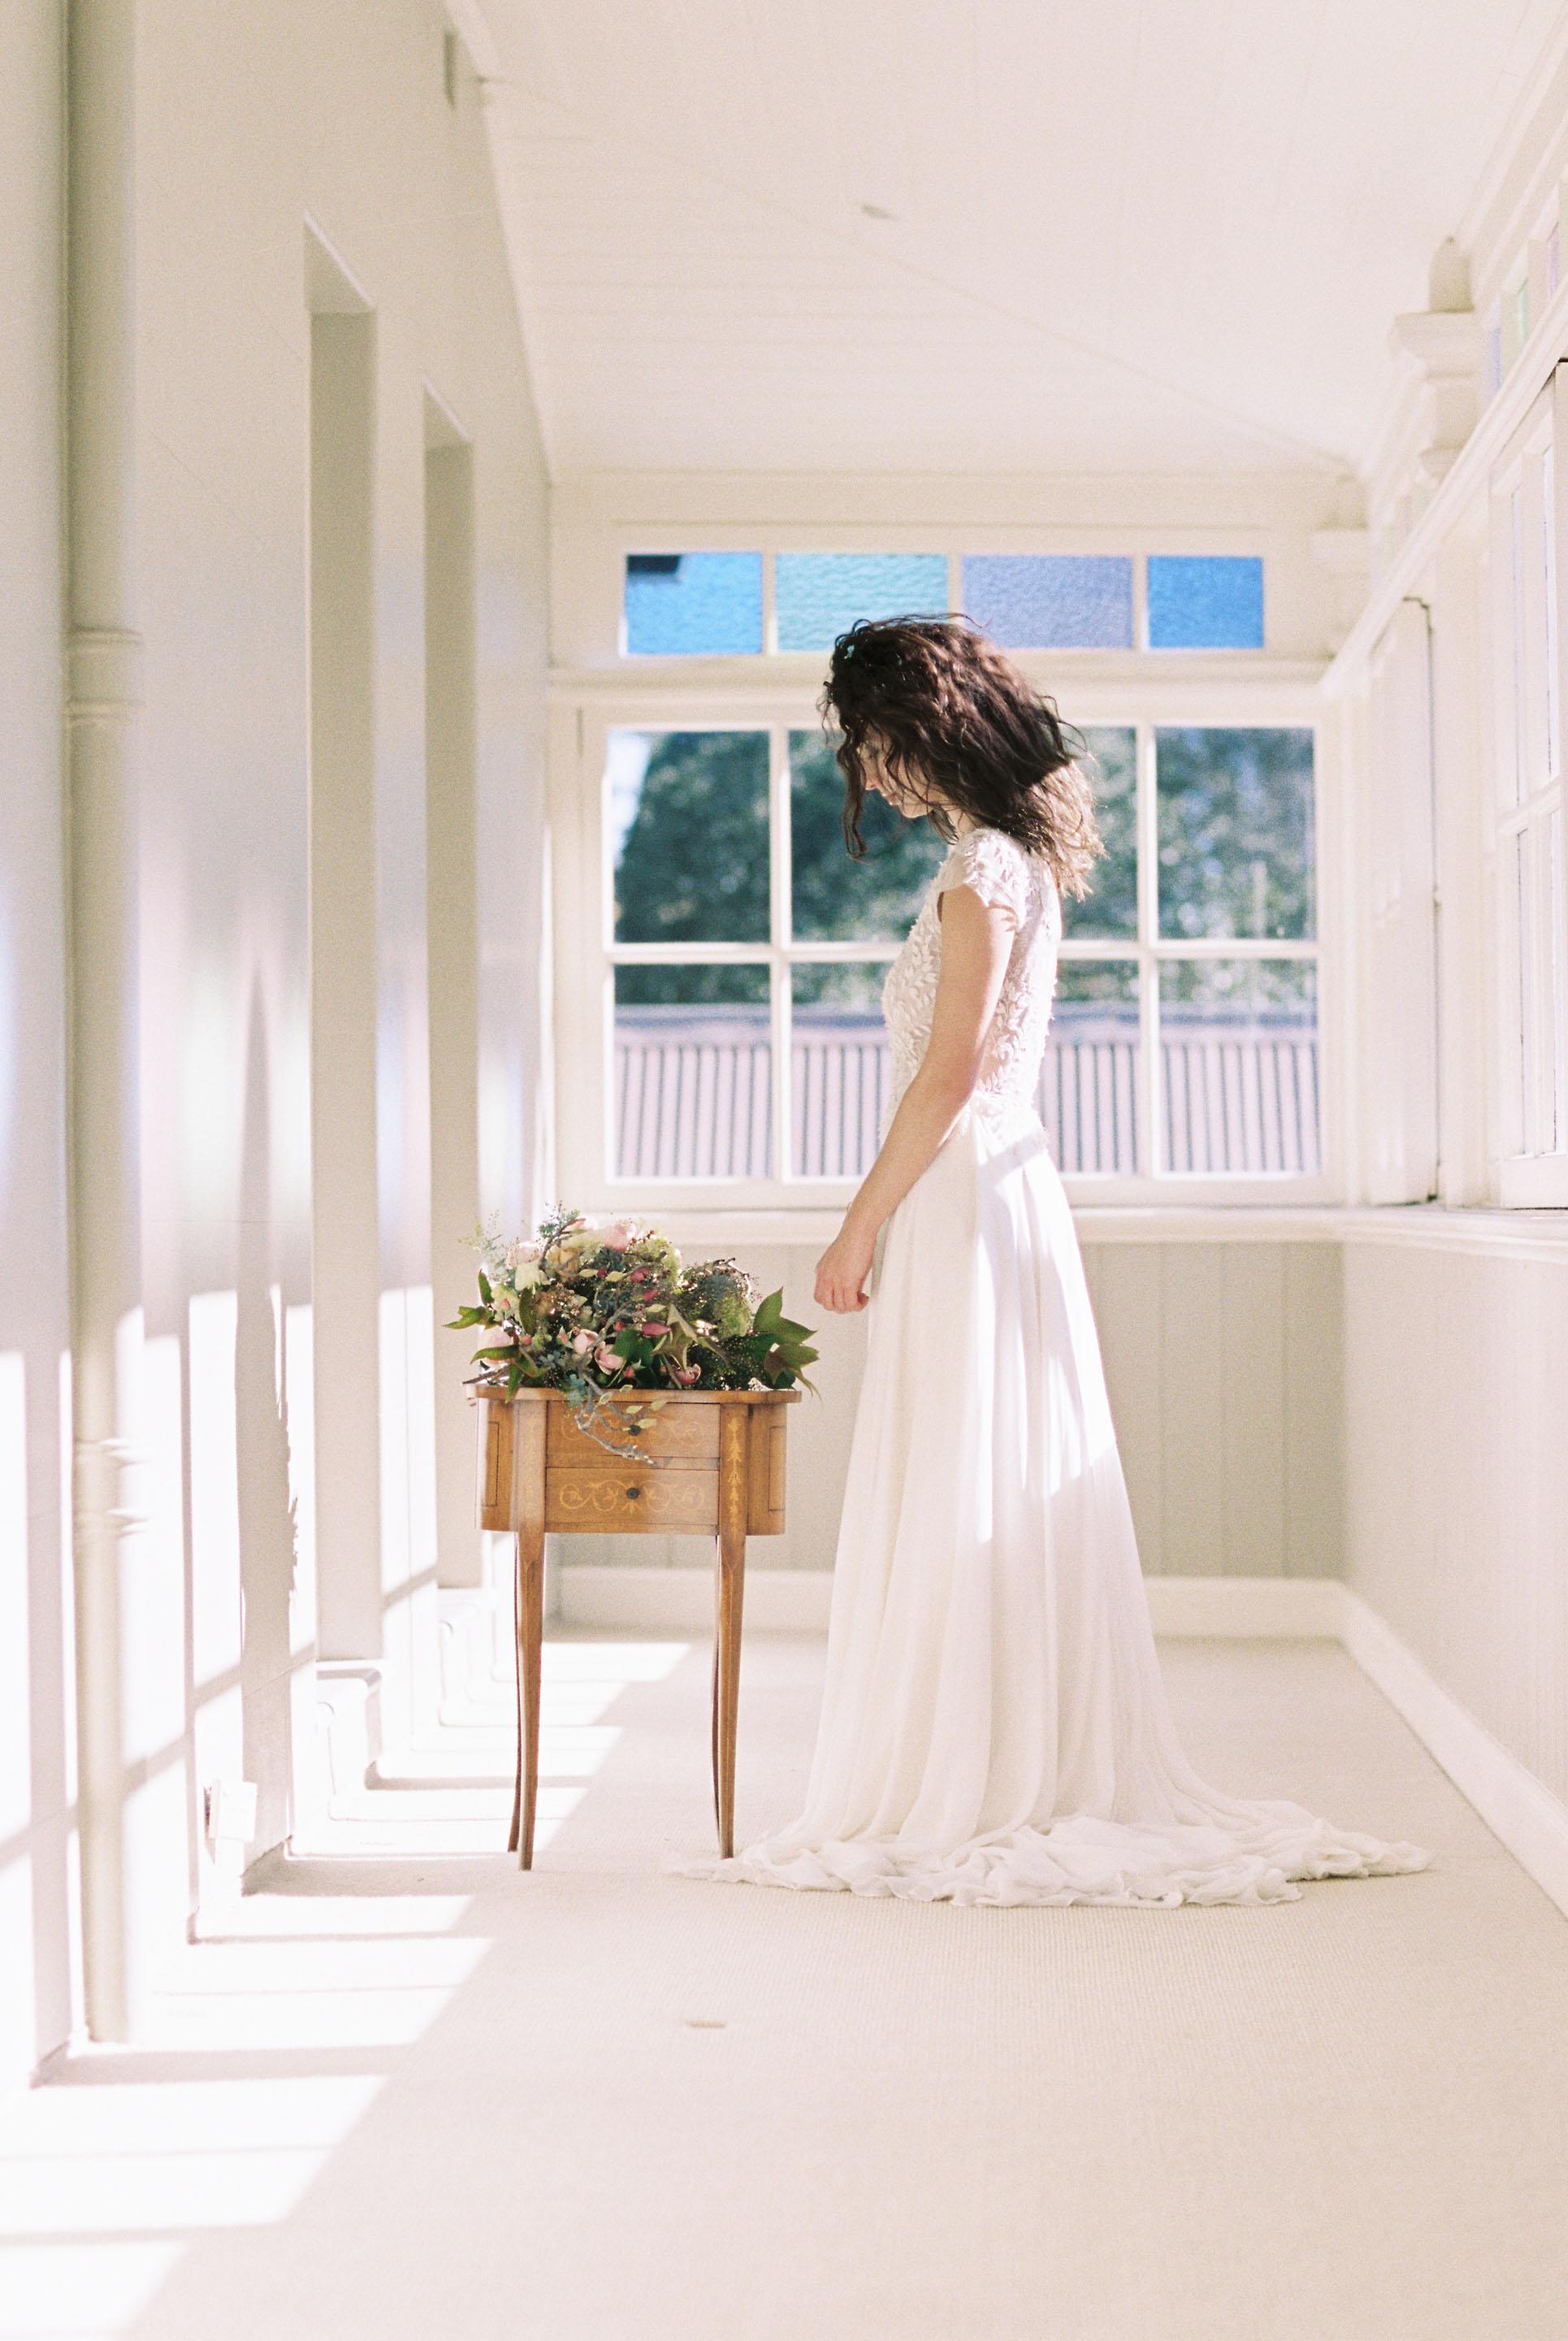 Willow bridal gown Tanya Anic Lilli Kad Photography Hopewood-173.jpg